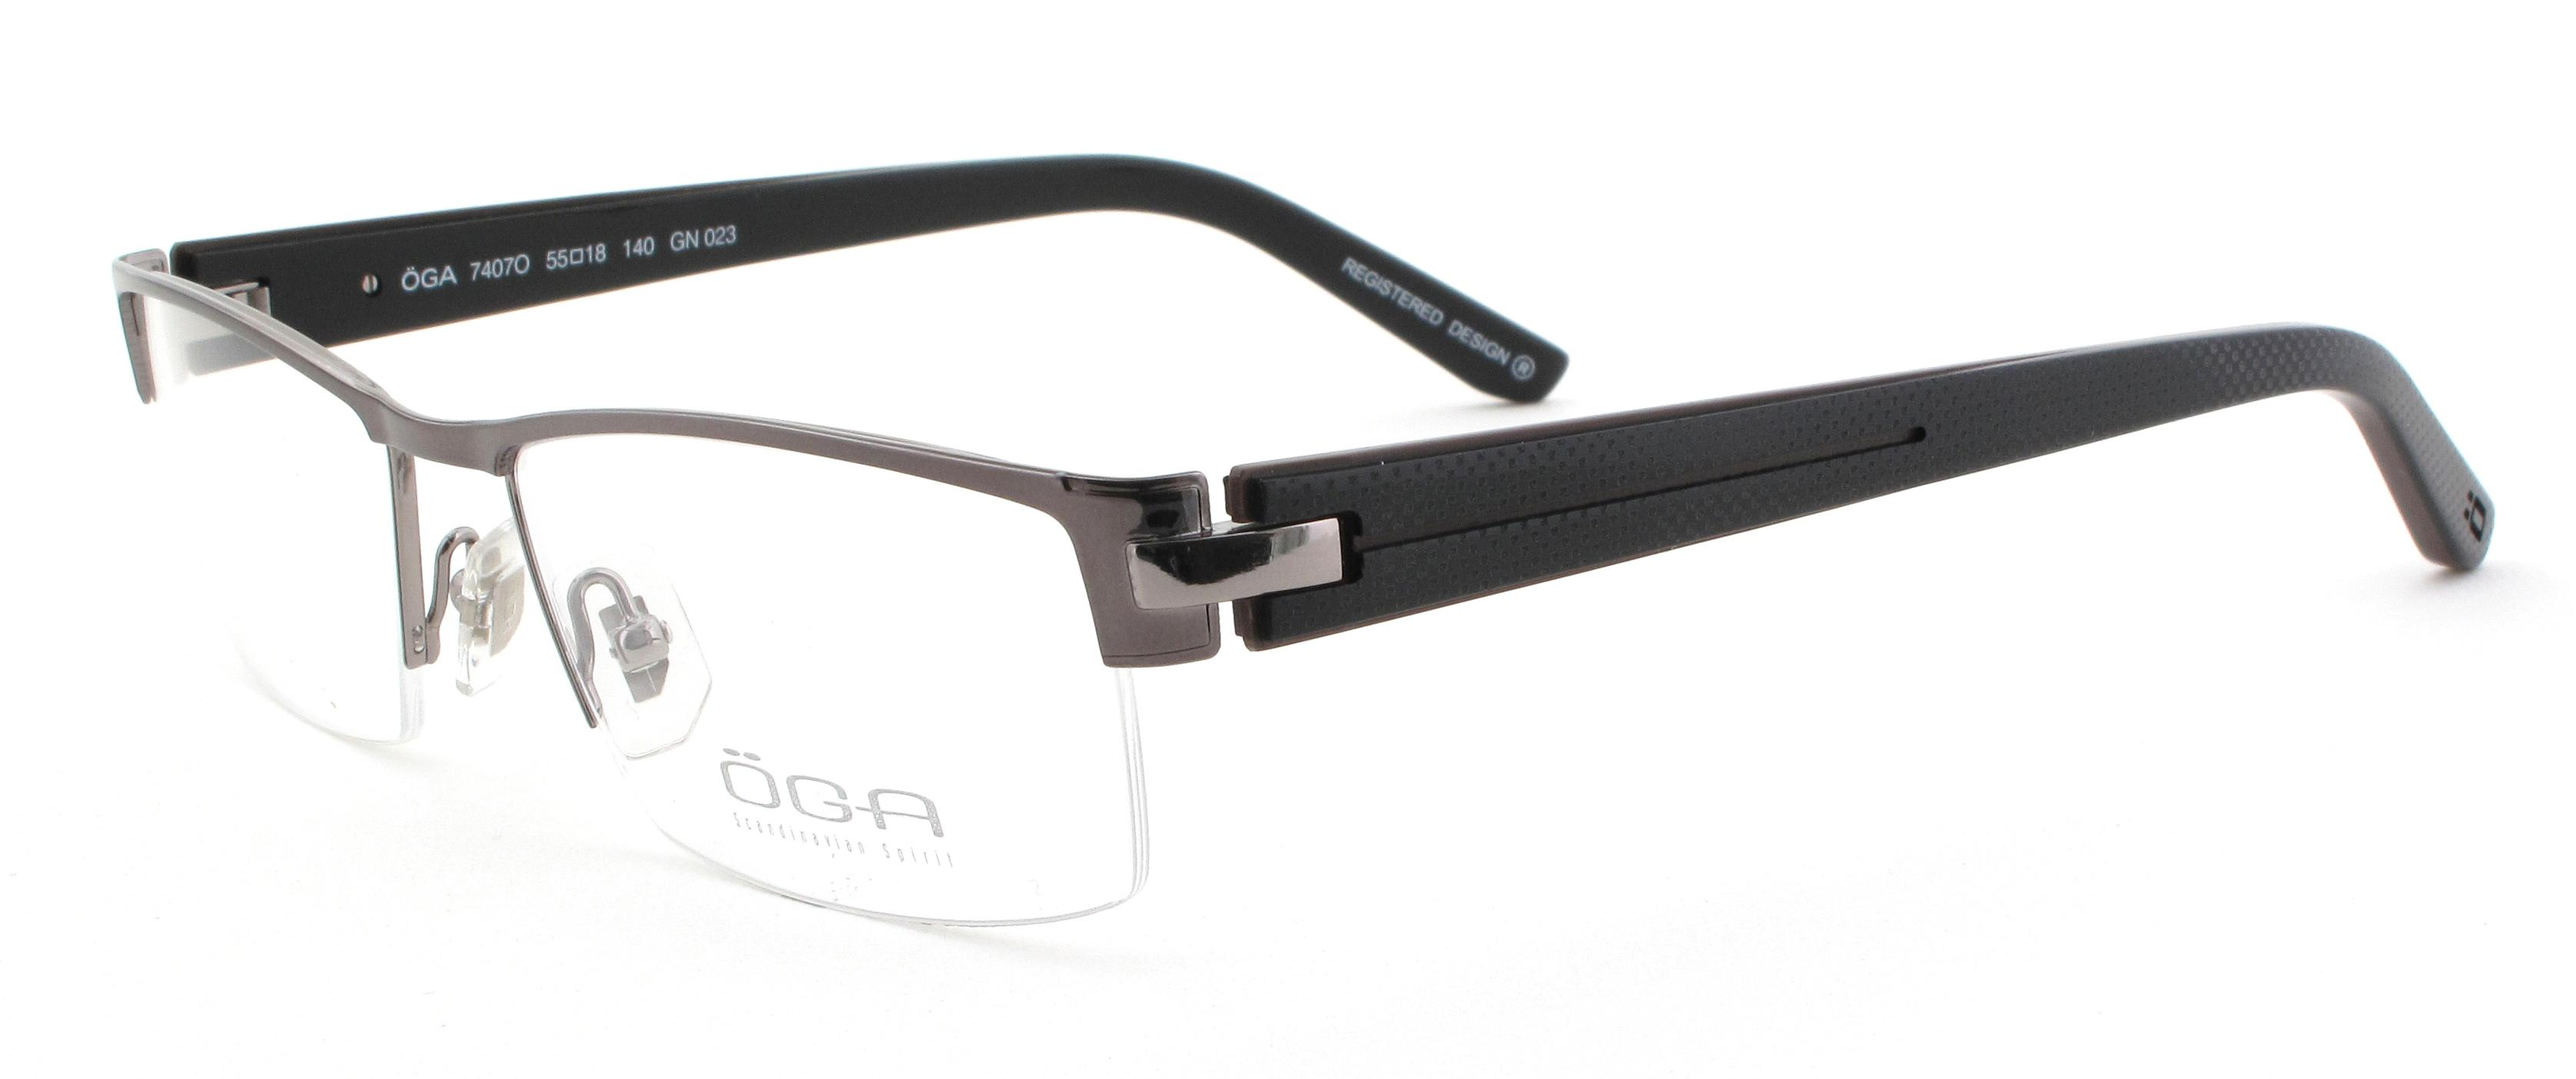 GN023 7407O TALVAC 1 Glasses, ÖGA Scandinavian Spirit